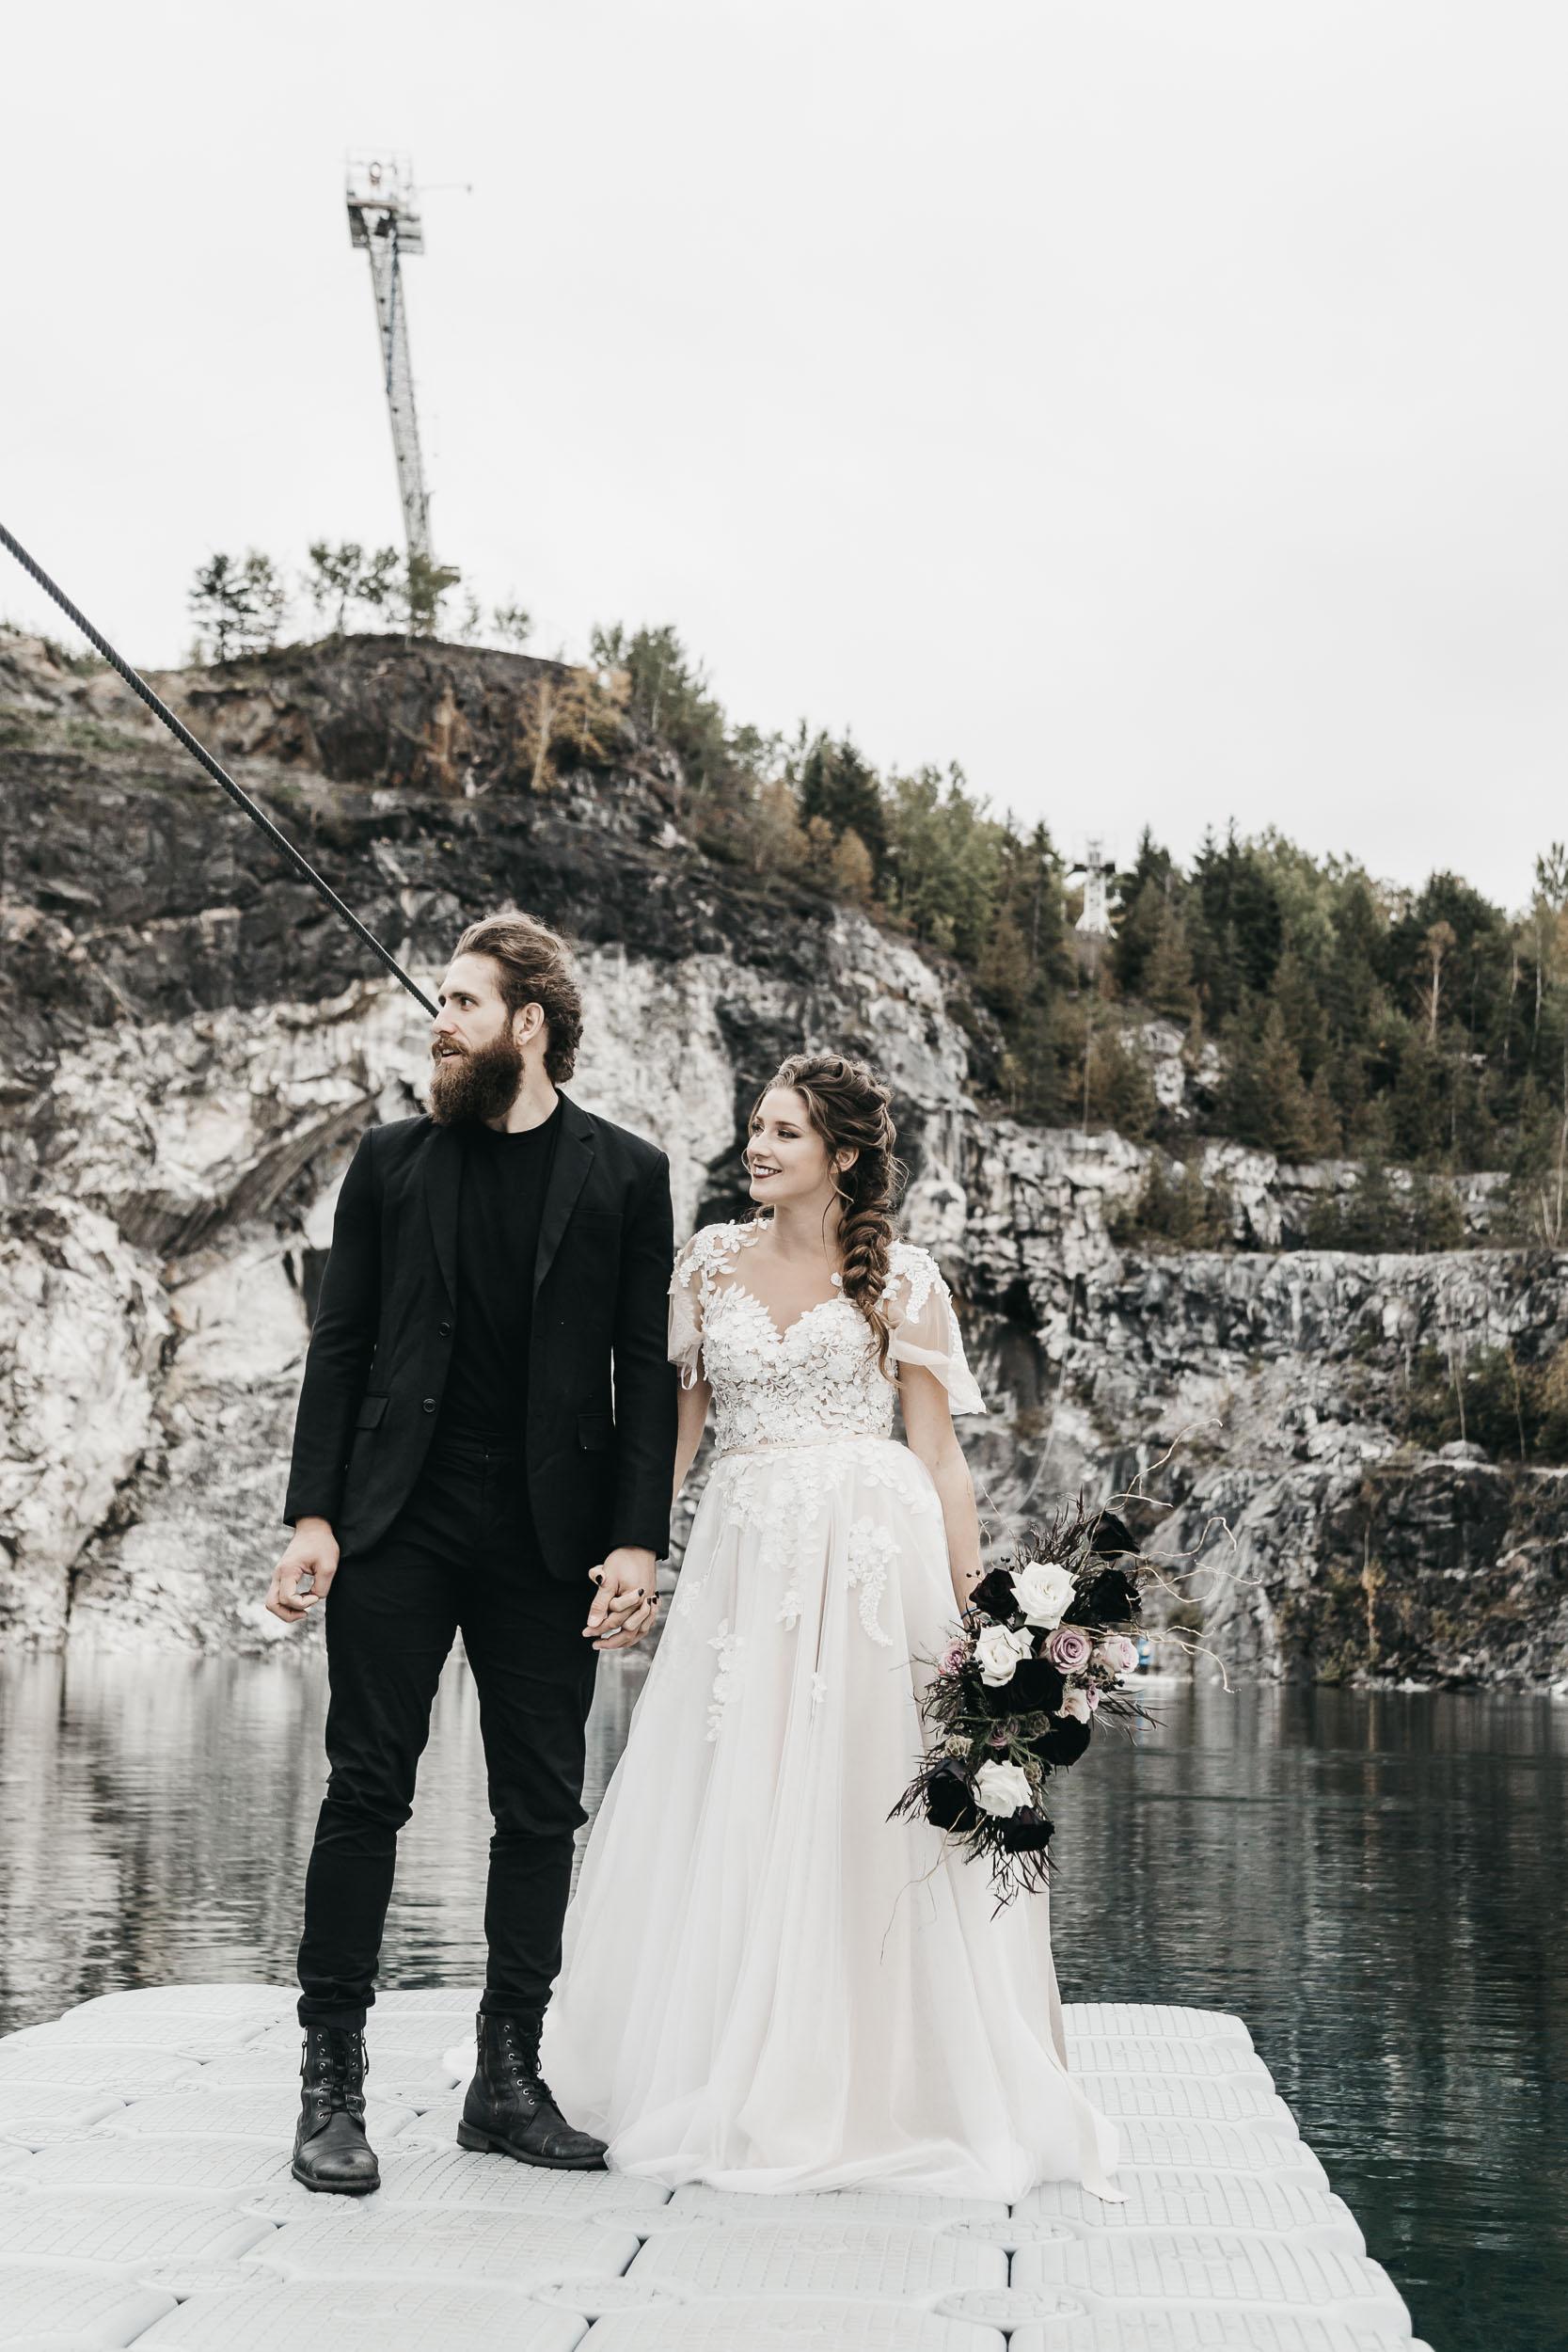 intimate-wedding-elopement-photographer-ottawa-toronto-9944.jpg